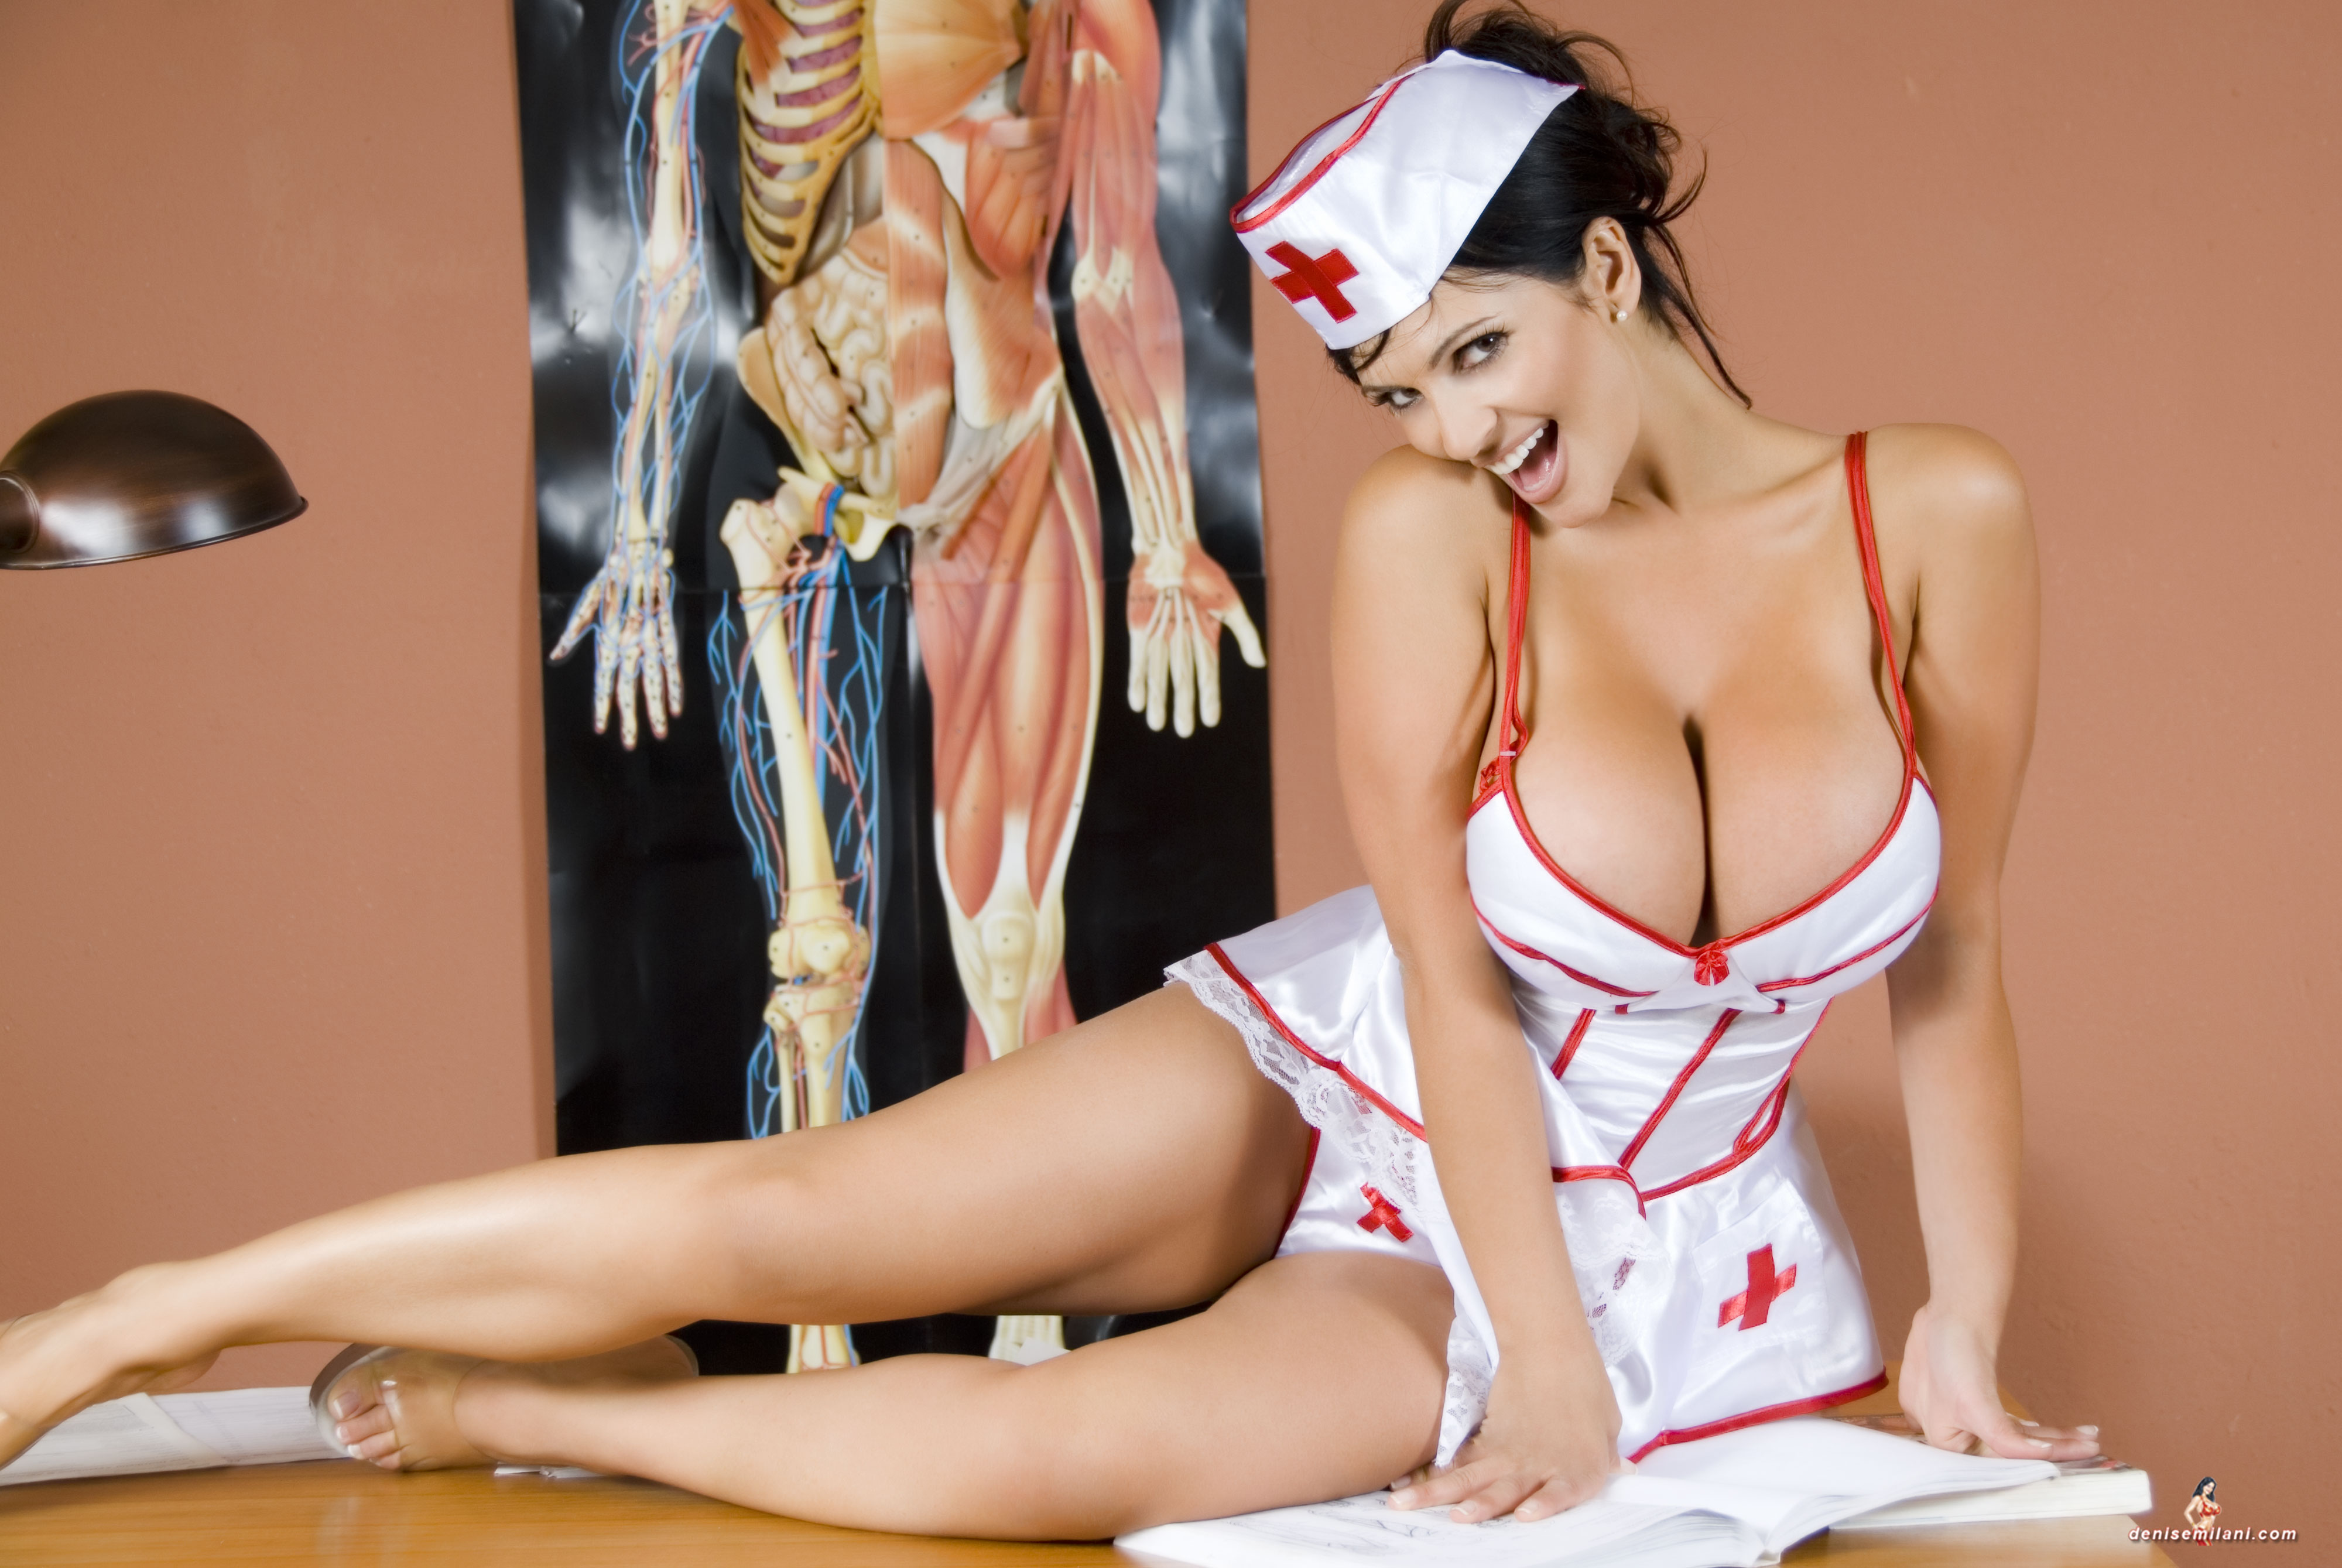 смотреть онлайн порно трахнул медсестру